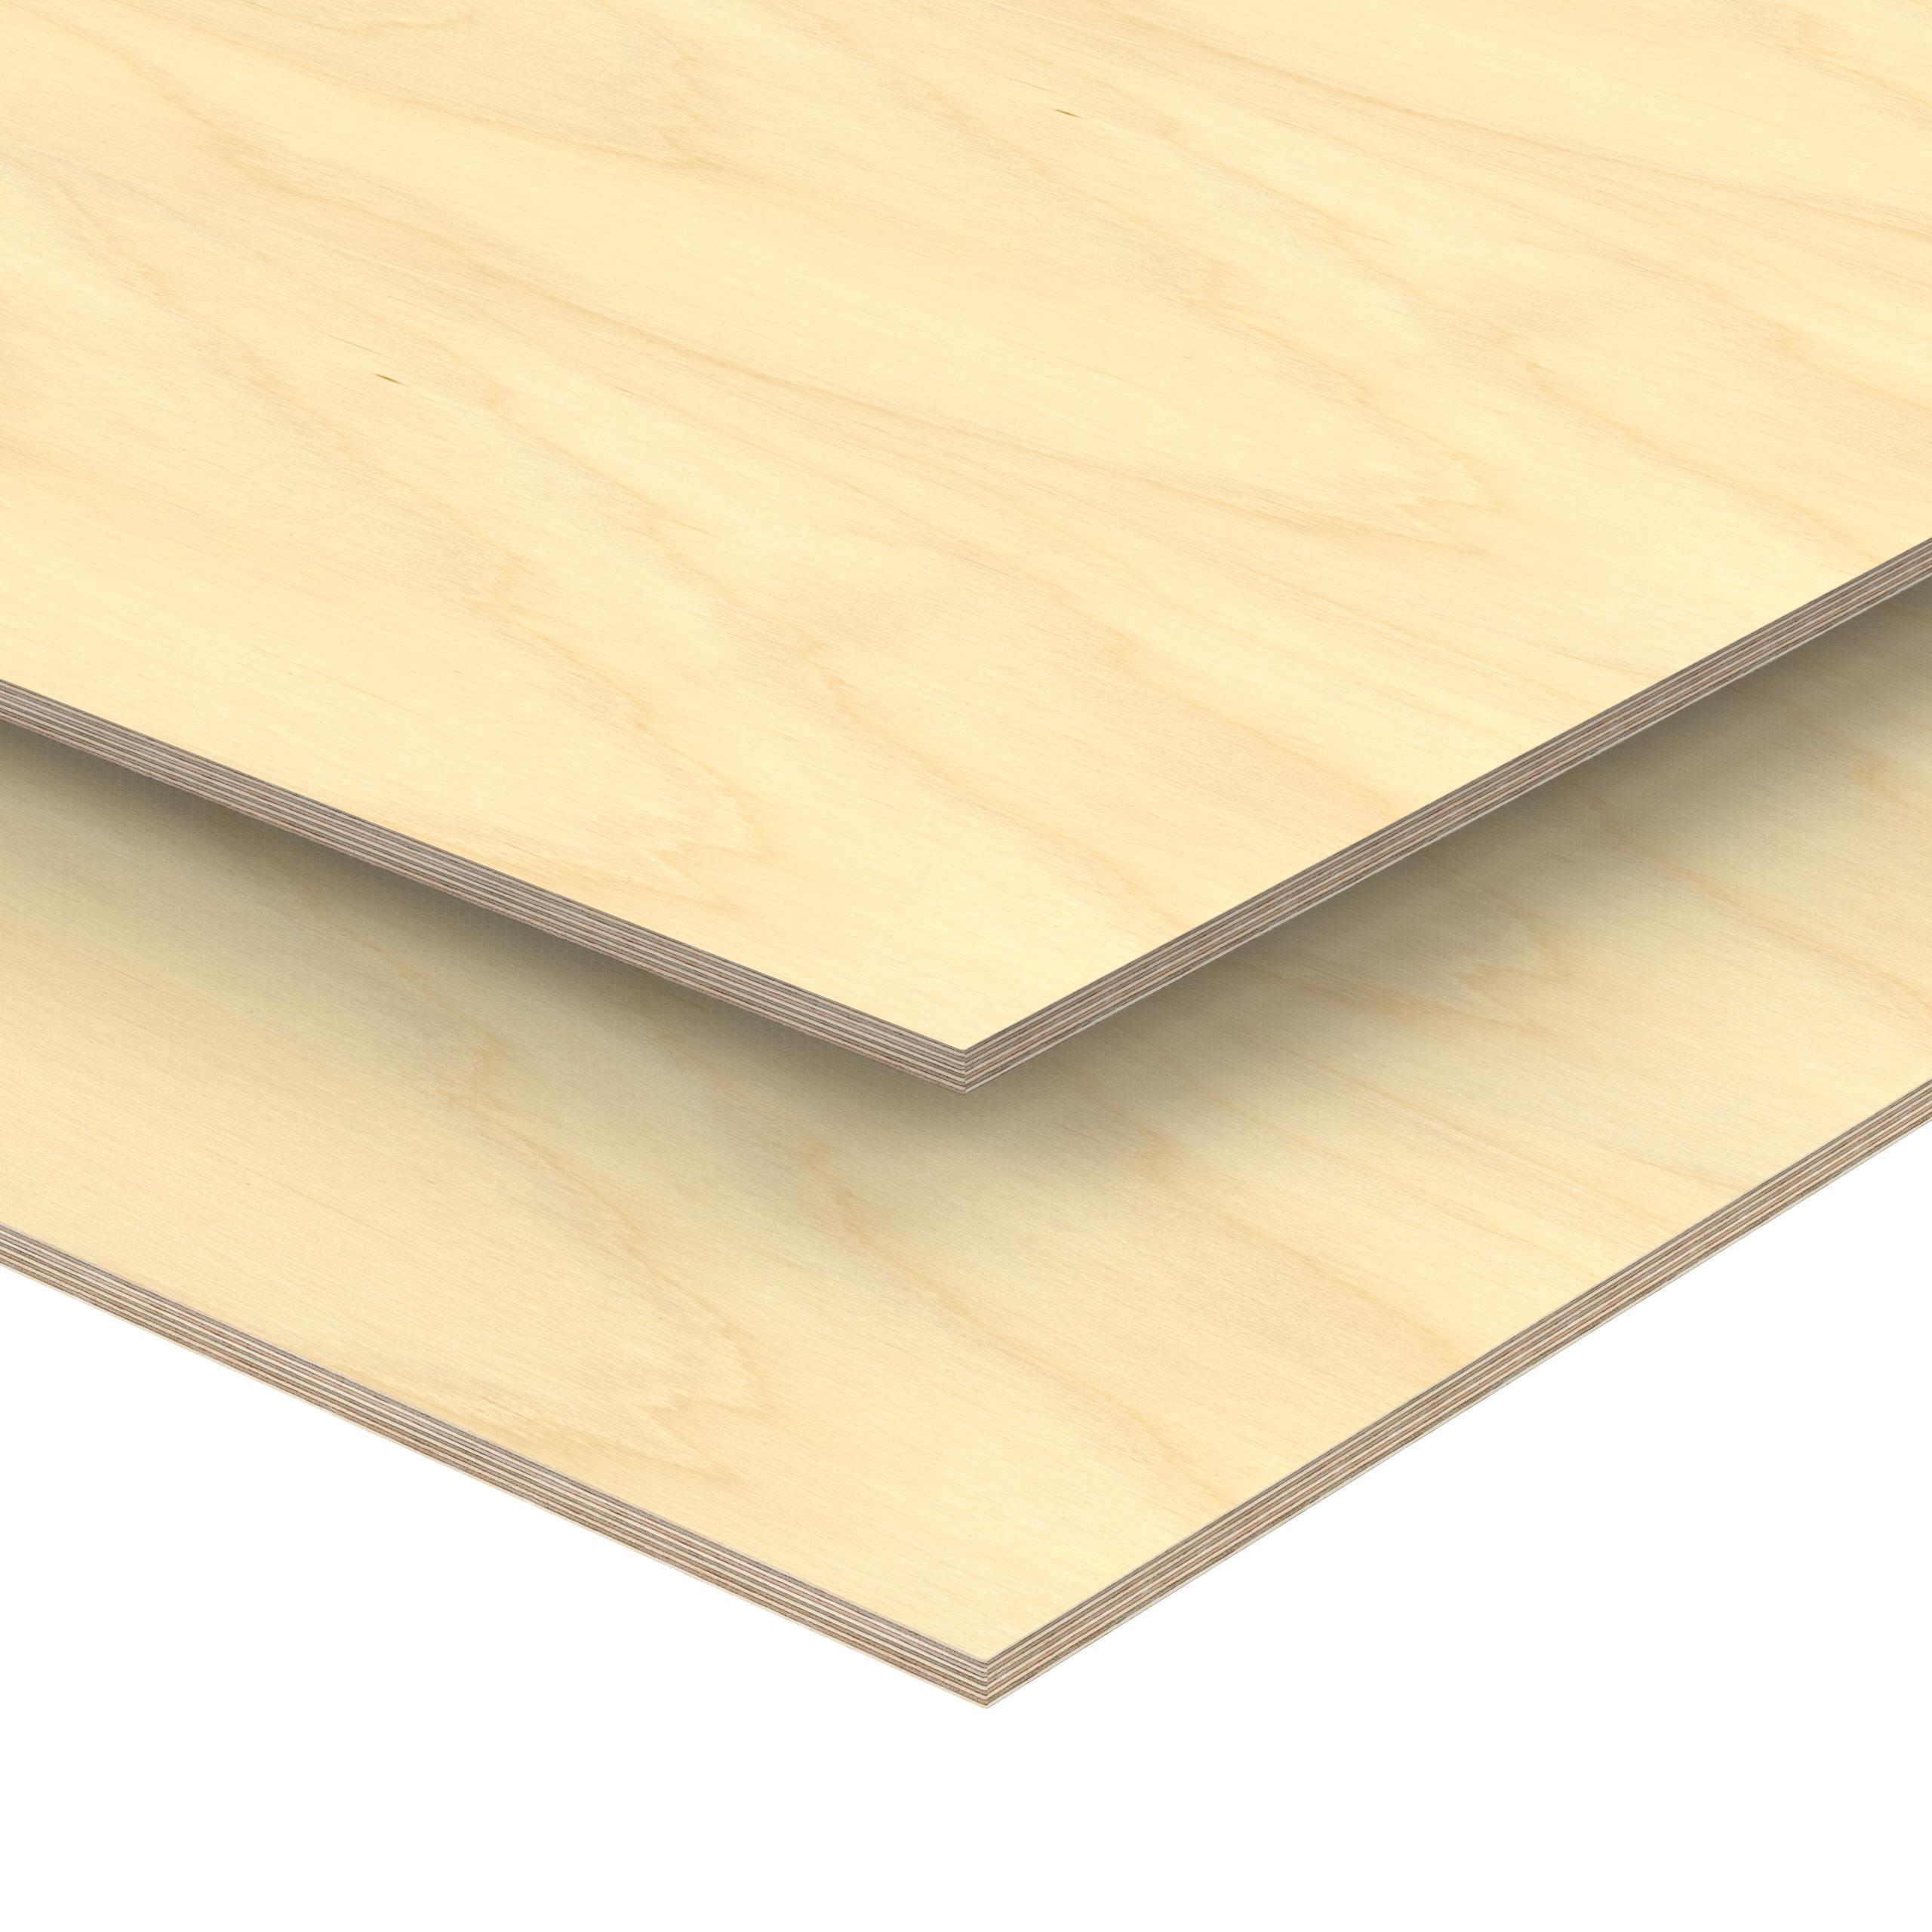 Sperrholz 13,00€//m² 5 mm Birke Sperrholzplatte Bastelholz 20 Platten 50 x 30 cm